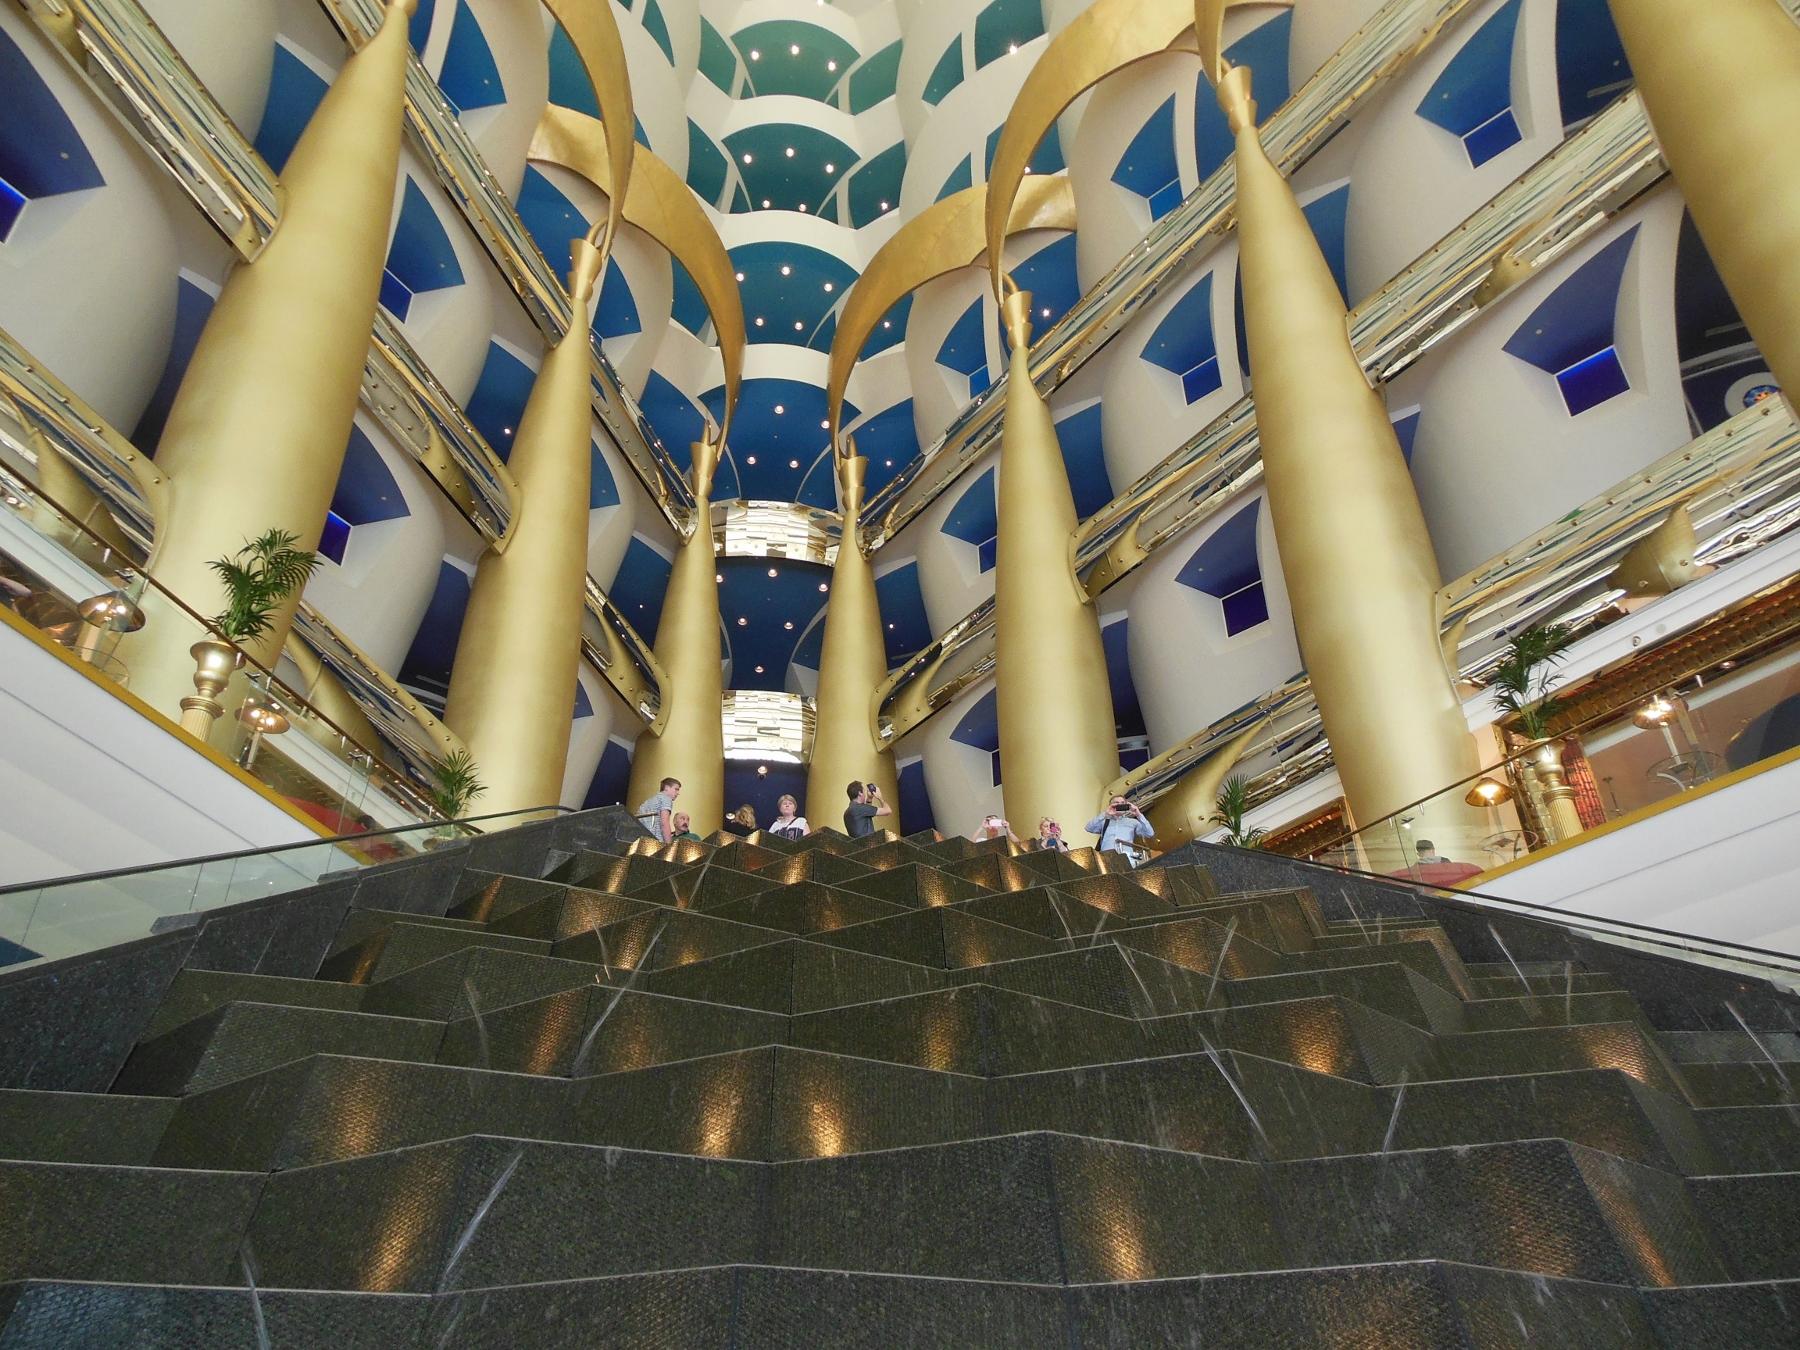 Burj al arab Foyer (1800x1350) - Kopie